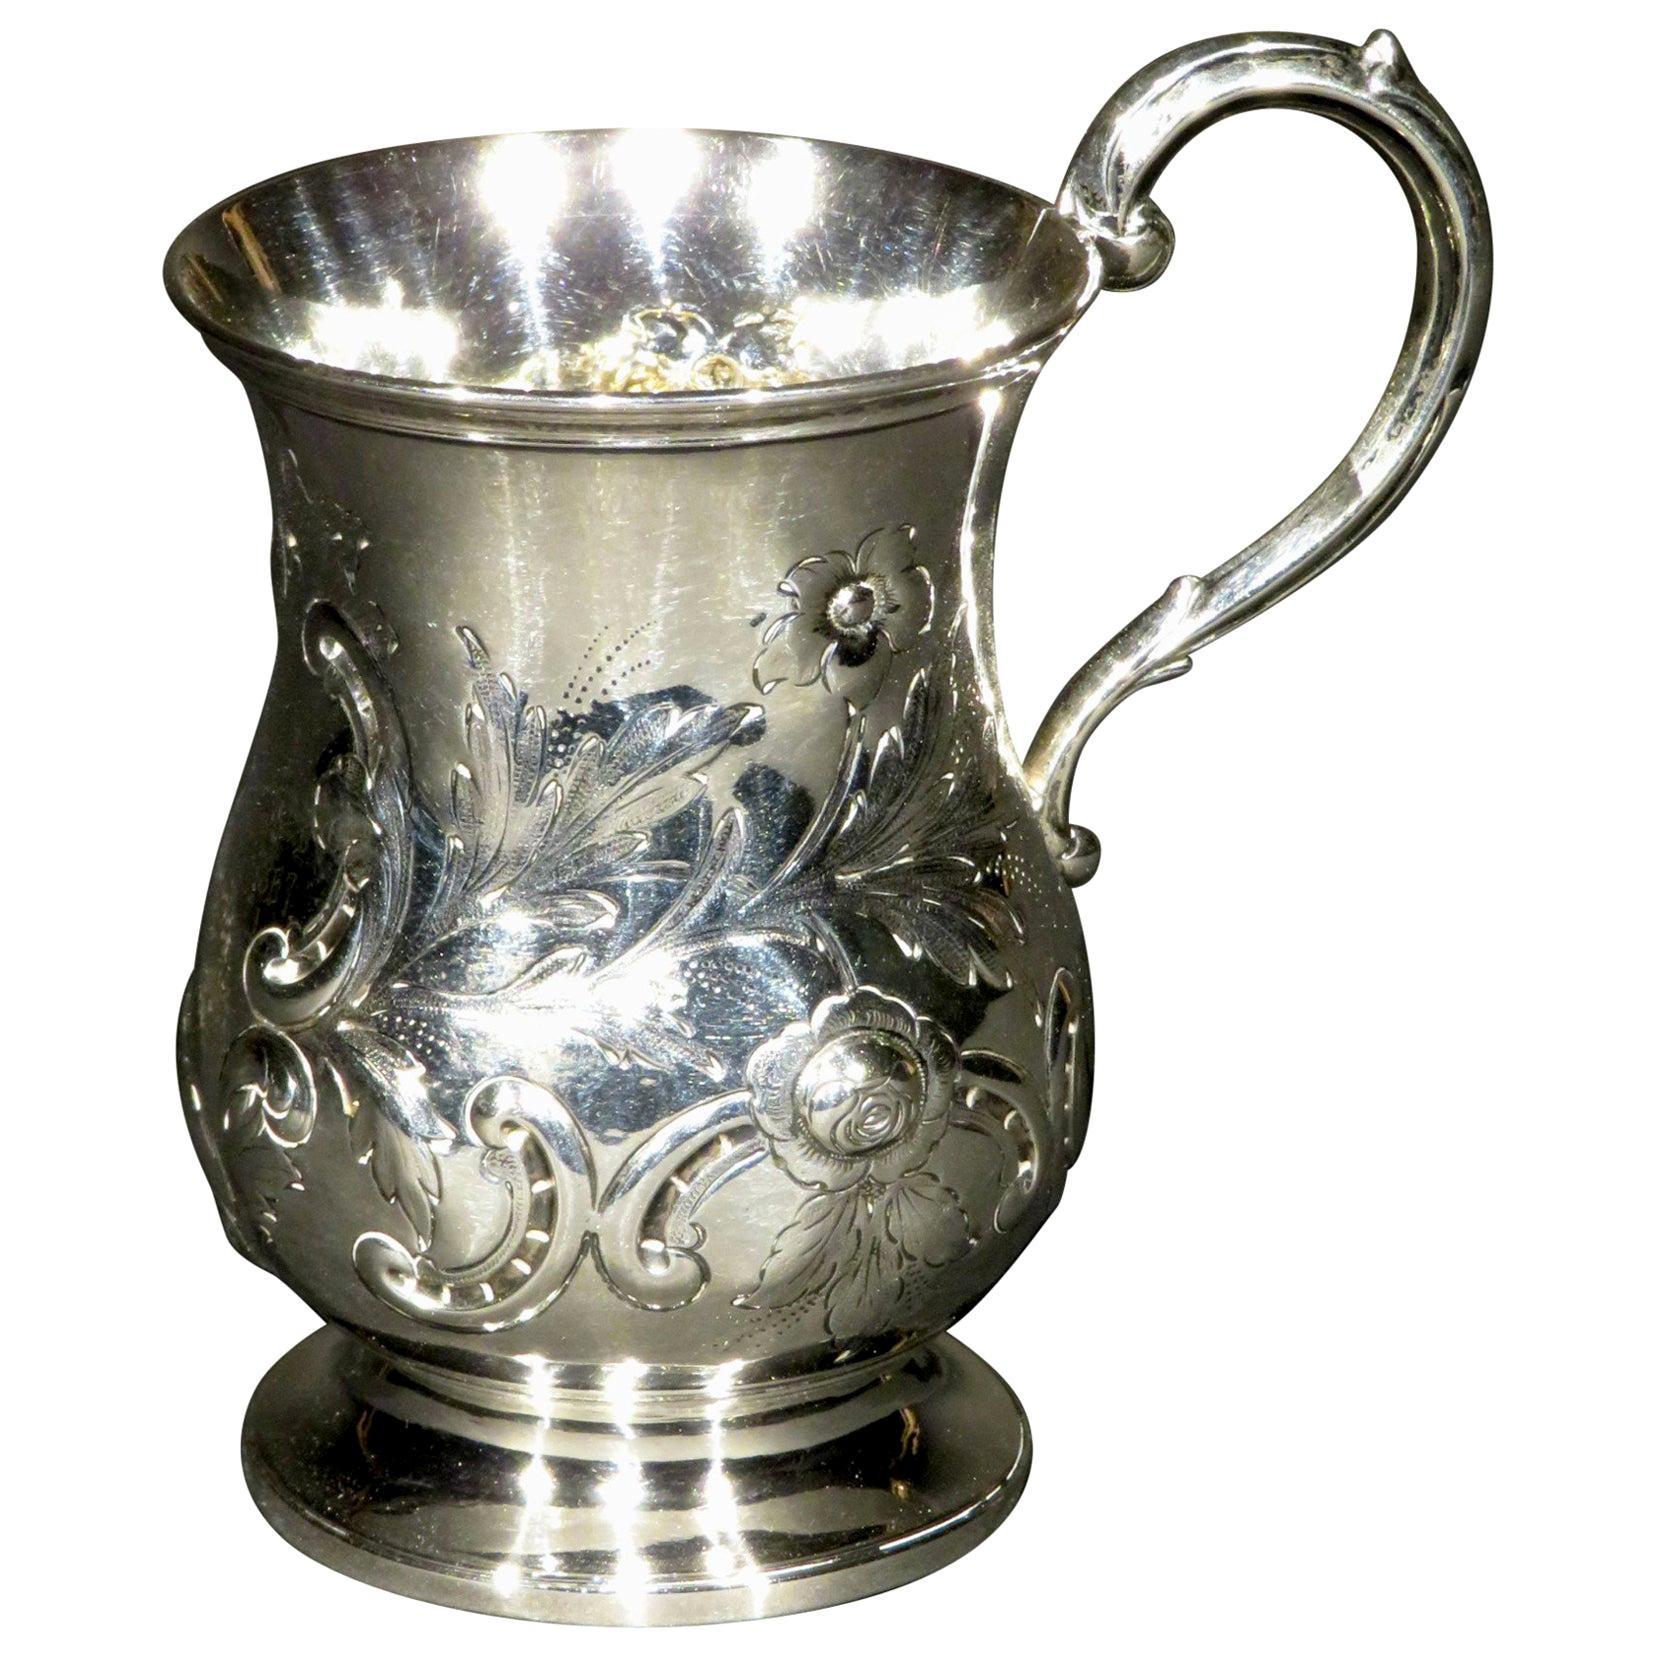 Very Good & Heavy 19th Century Sterling Silver Christening Mug, London 1866